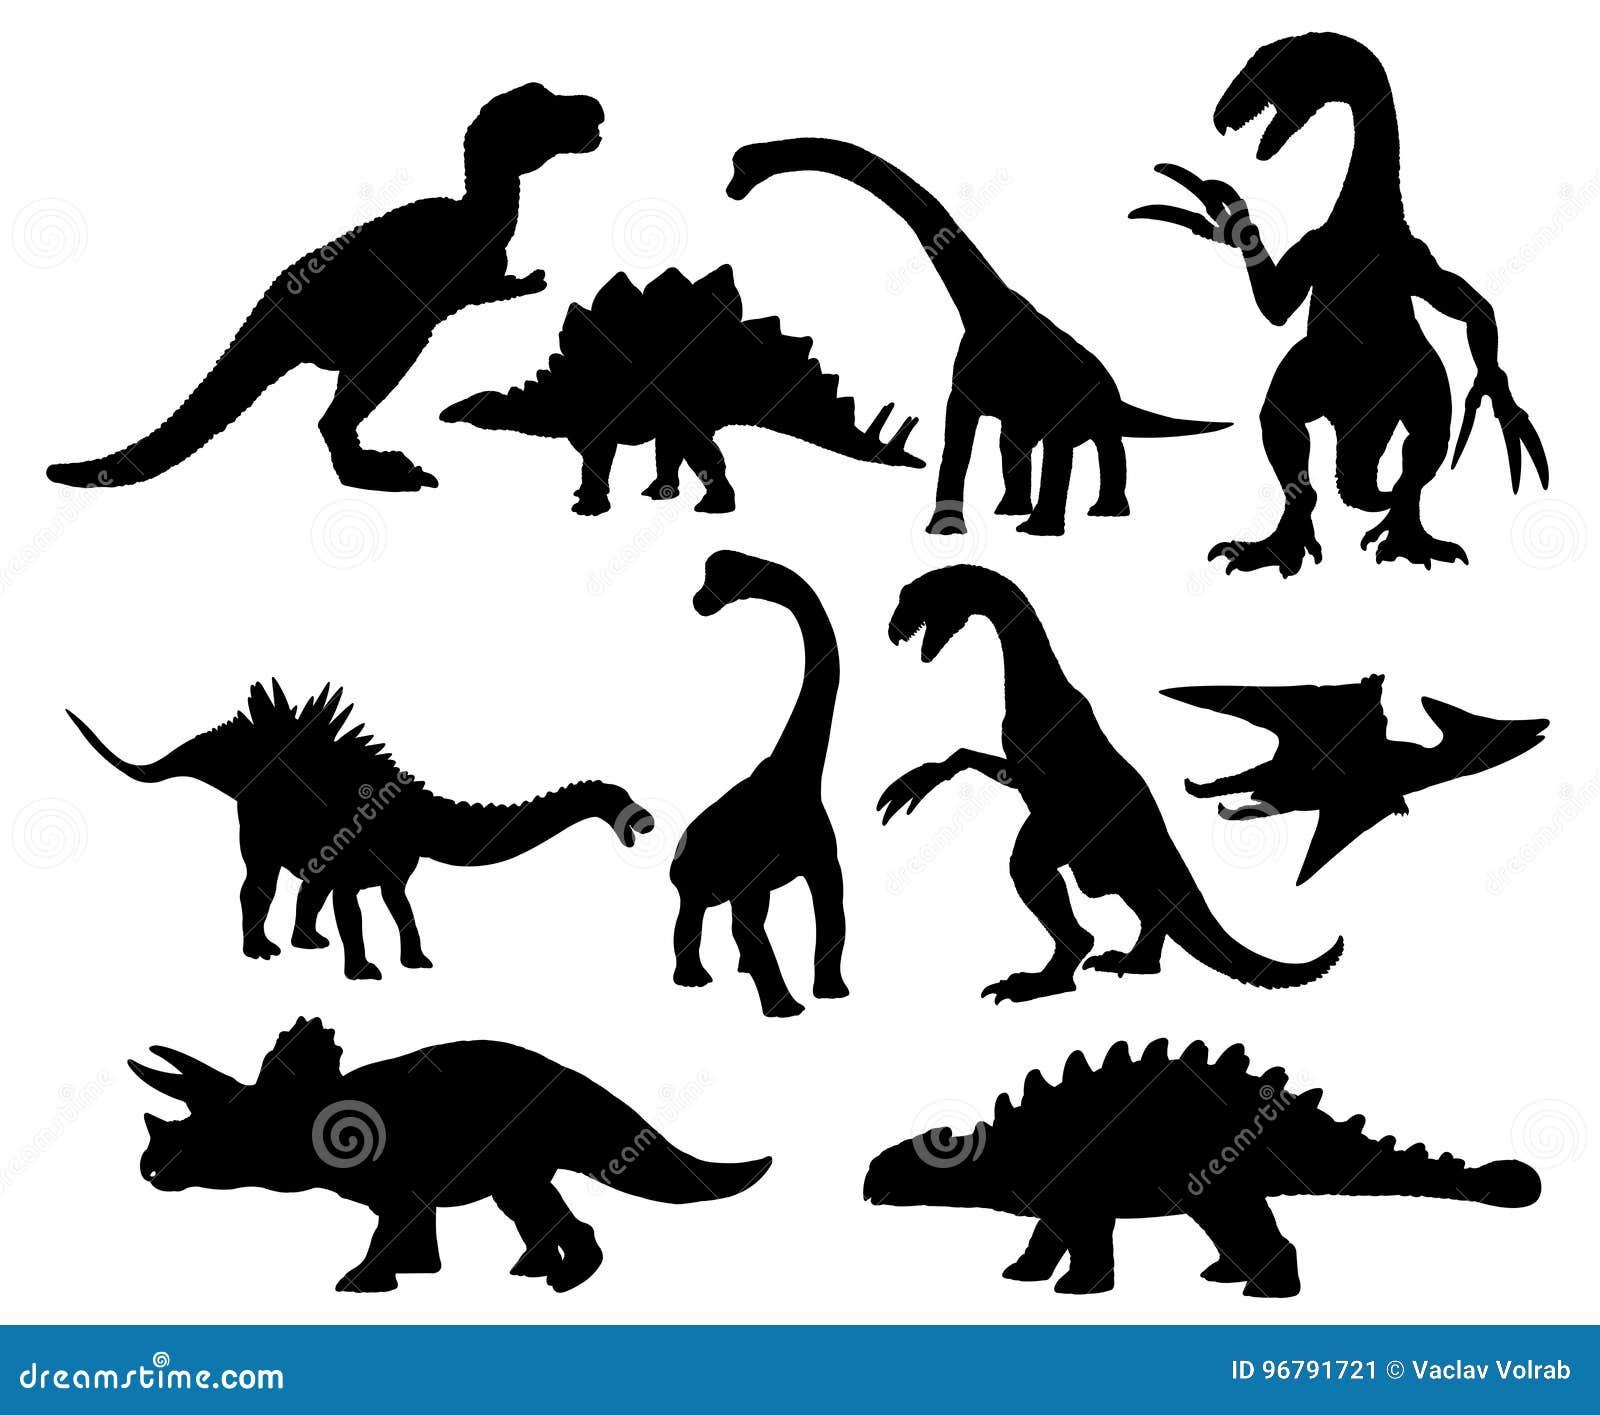 Ensemble de silhouettes de dinosaures